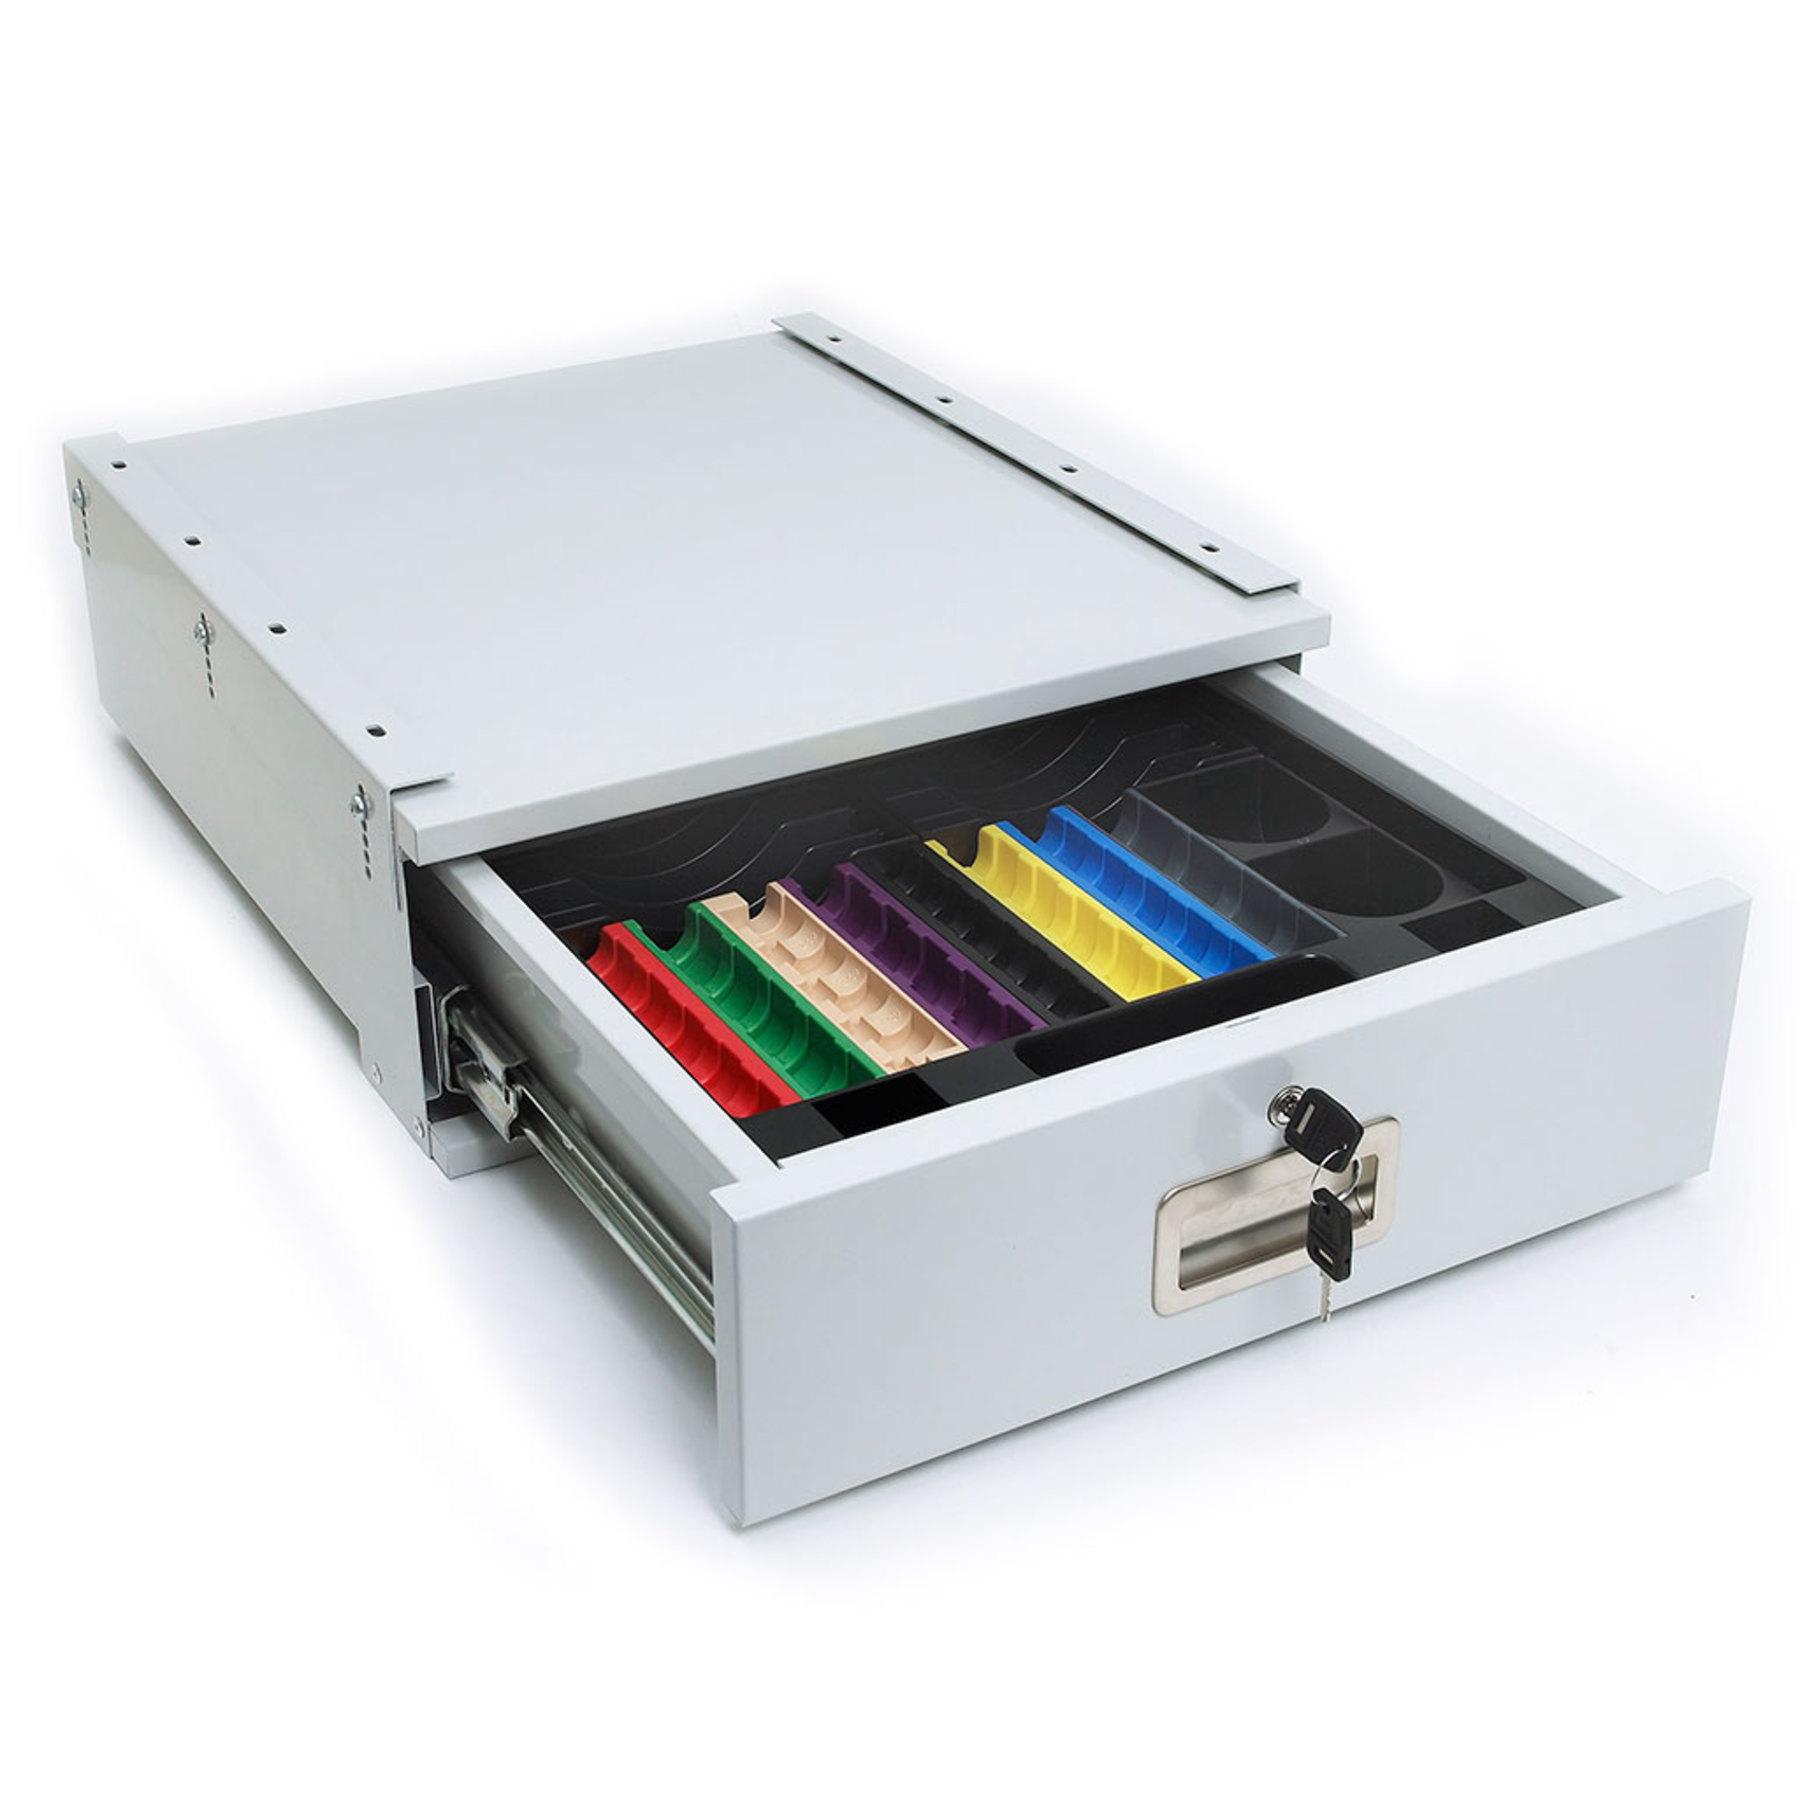 hdc180 heavy duty under counter cash drawer cash drawers. Black Bedroom Furniture Sets. Home Design Ideas